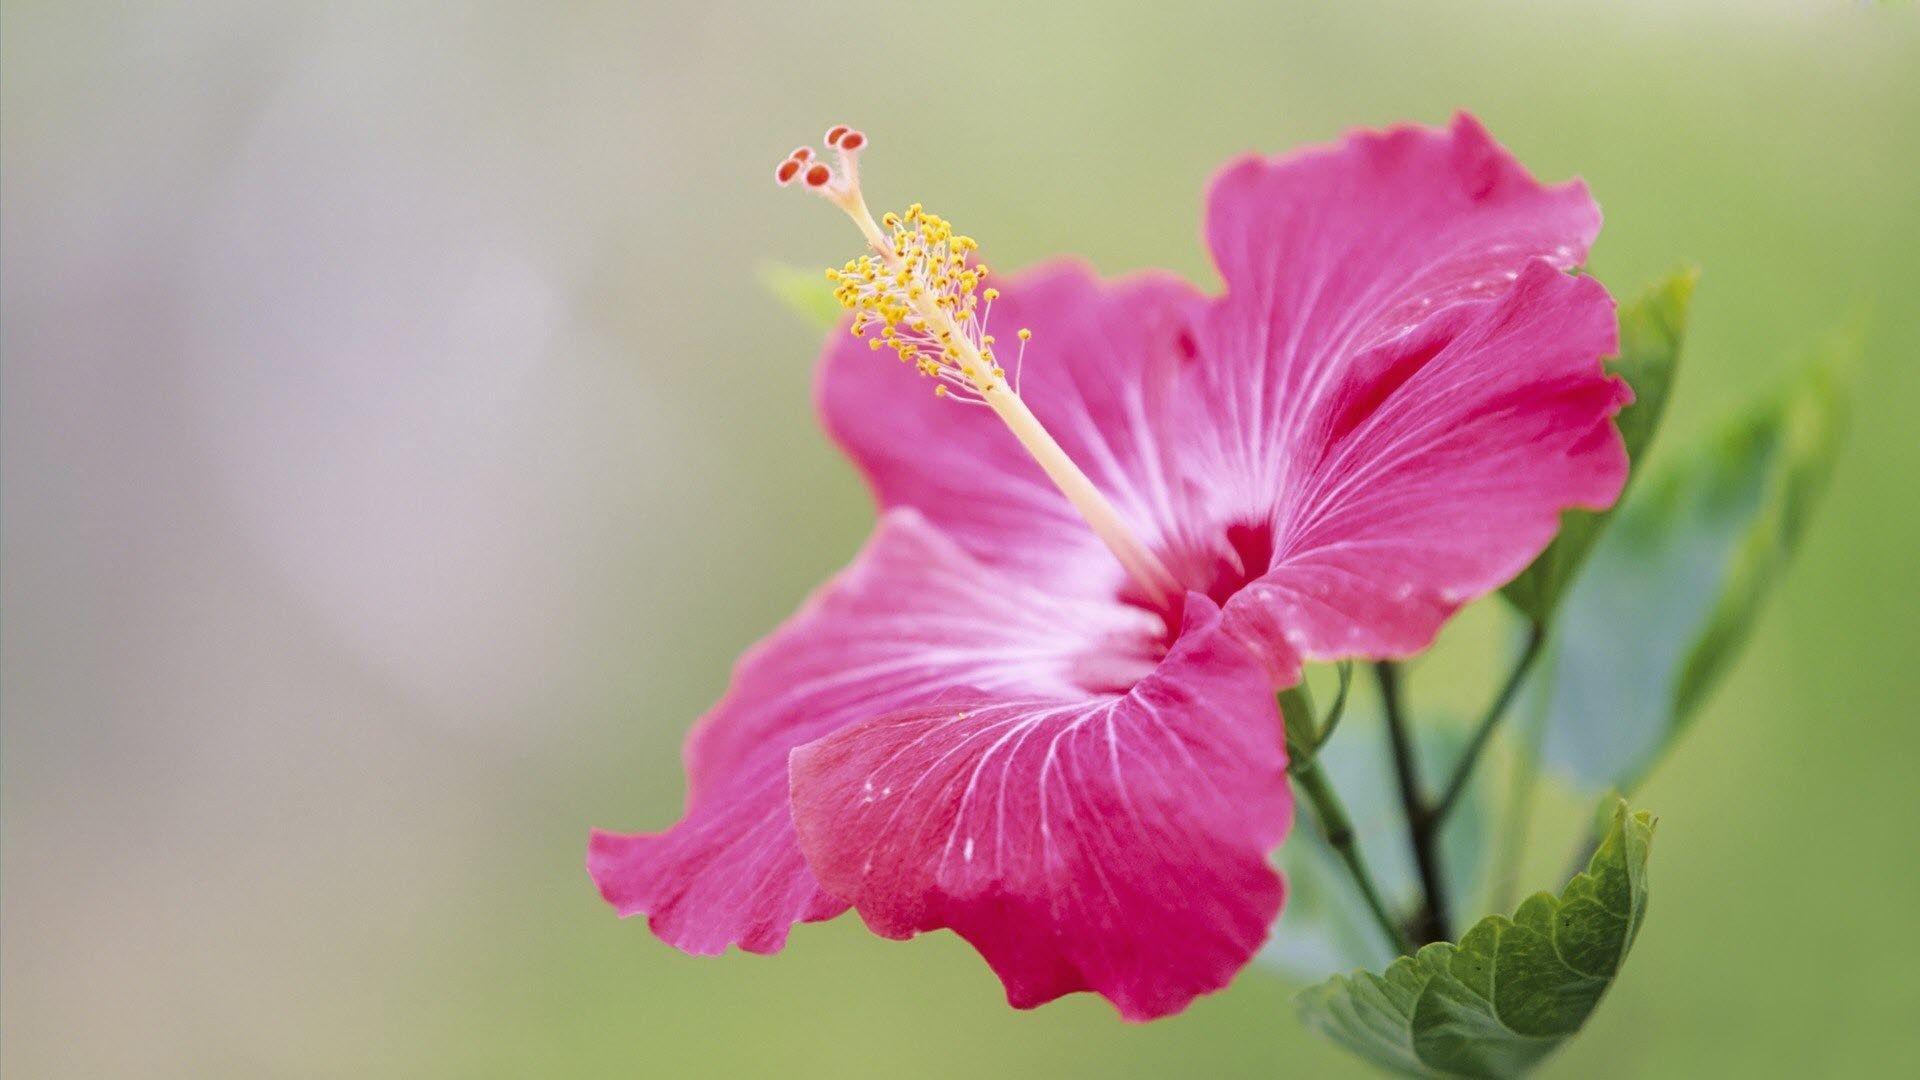 Hd Wallpaper Flower Download Hibiscus Plant Pink Flowers Wallpaper Hibiscus Flower Meaning